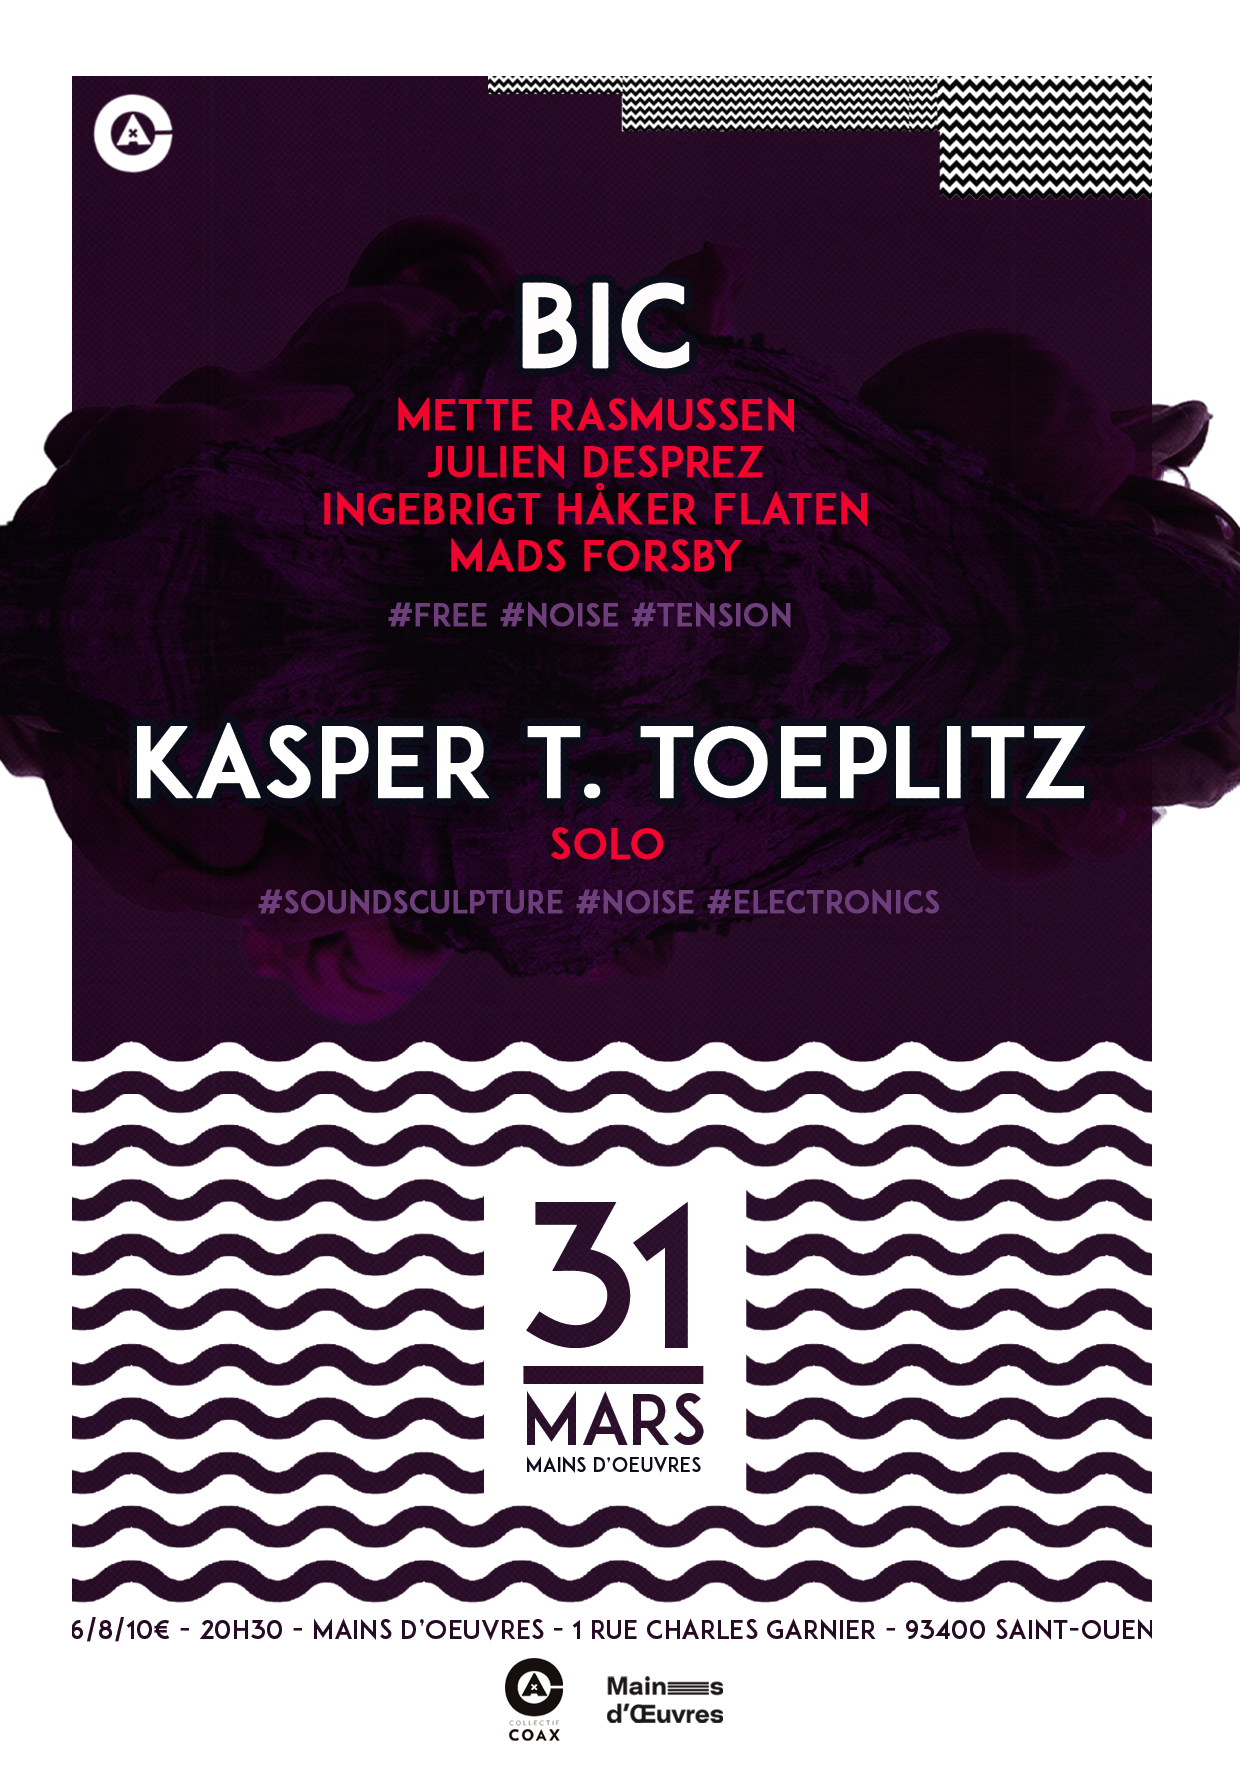 Soirée Coax w/ BIC + KASPER T. TOEPLITZ